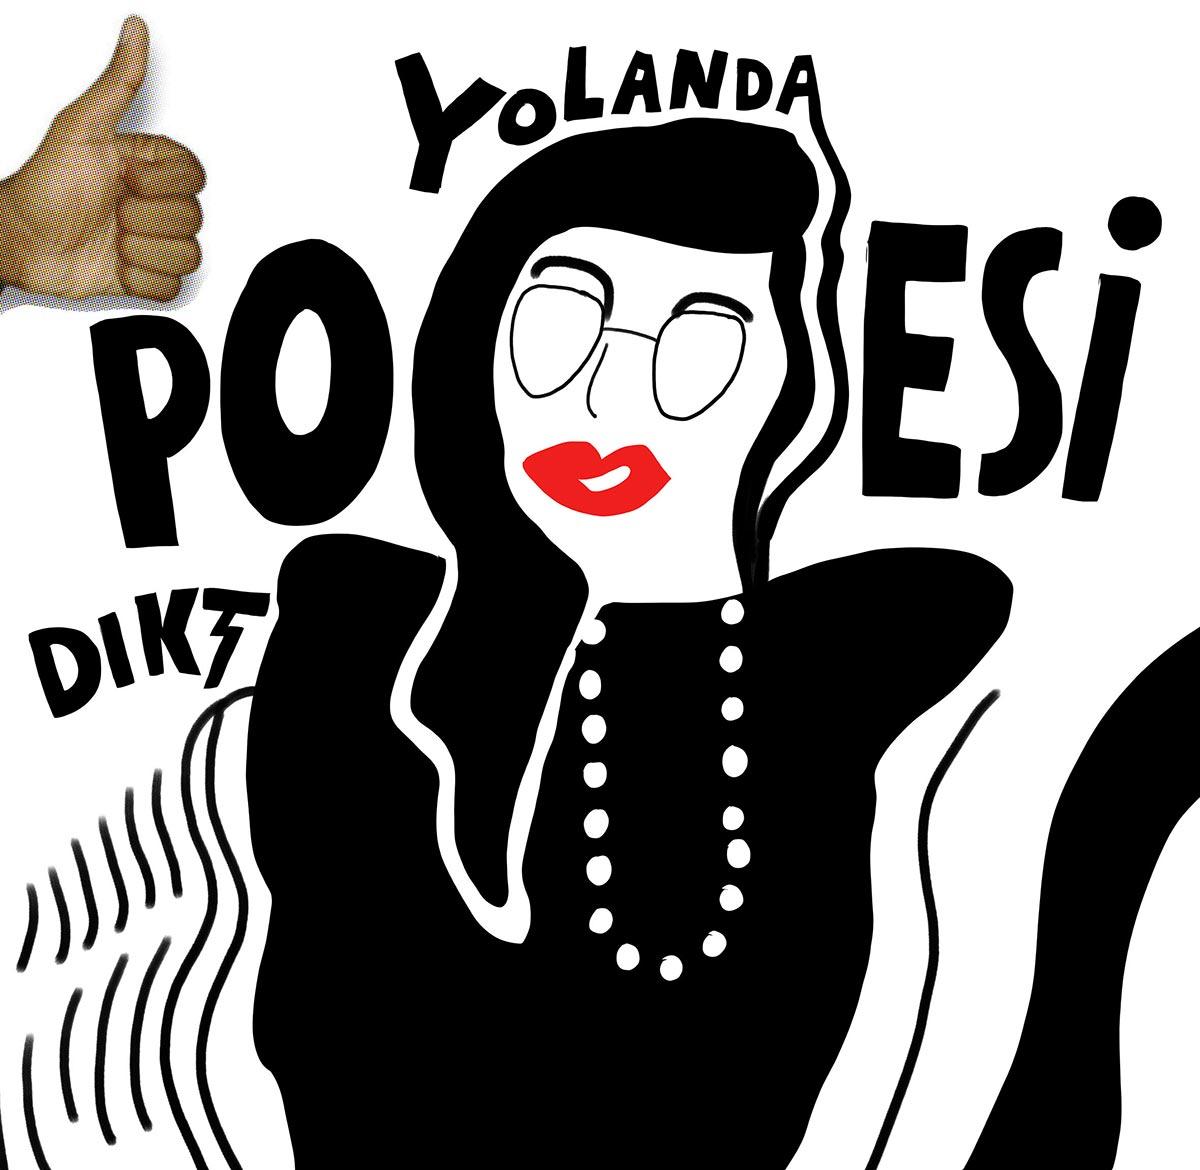 Yolanda 1. Per José Karlen 2021